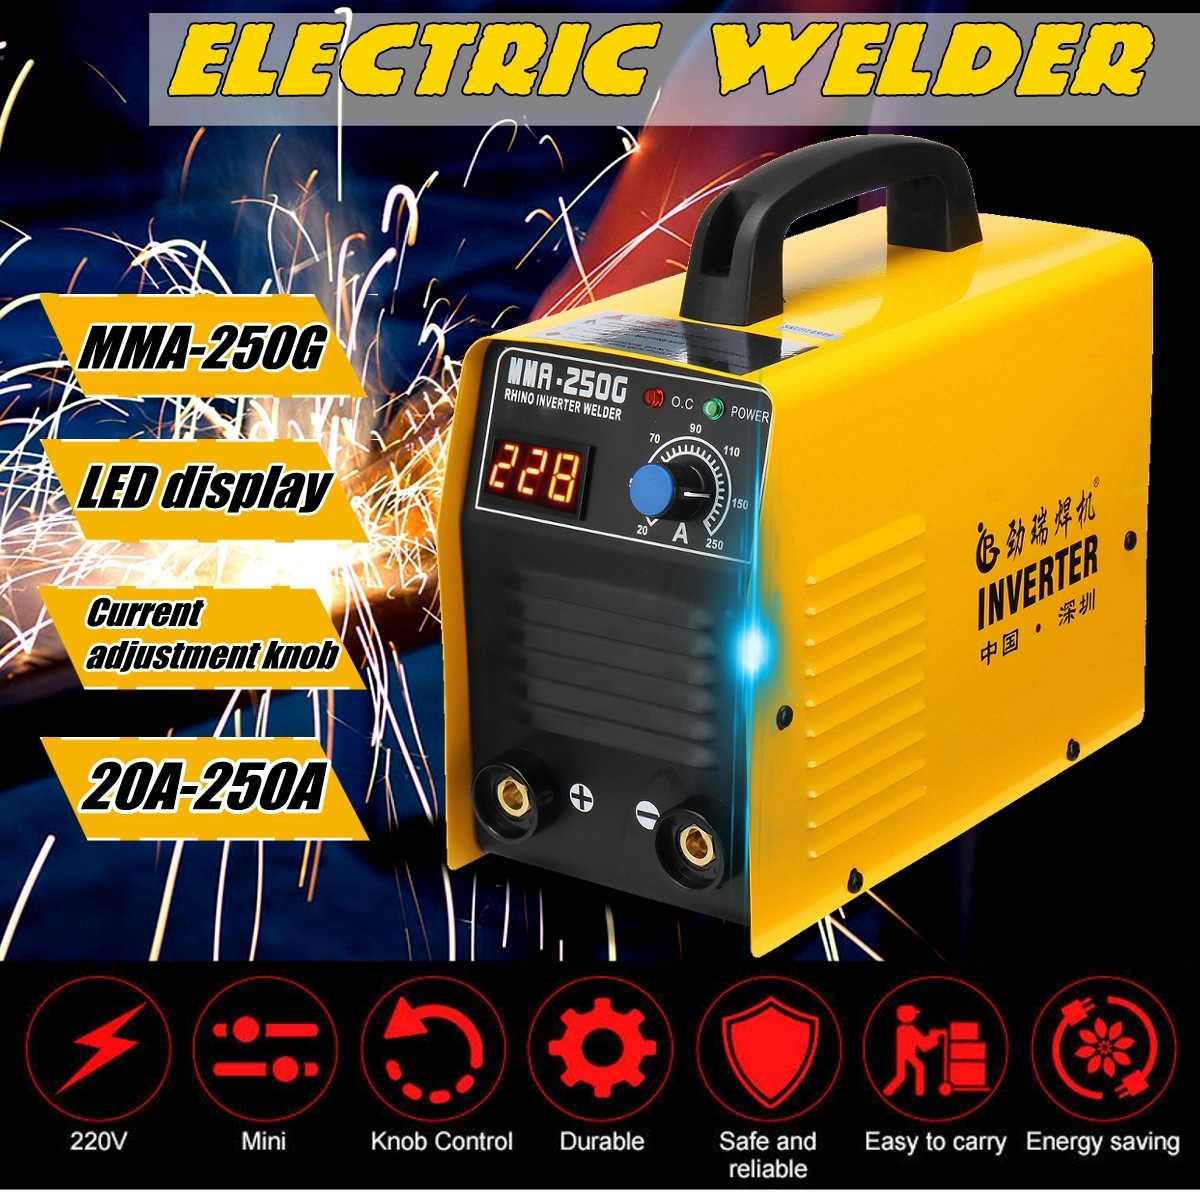 MMA 250G 220V Electric Arc Welders IGBT Inverter MMA ARC Welding Soldering Machine Welding Equipment for Home Beginner